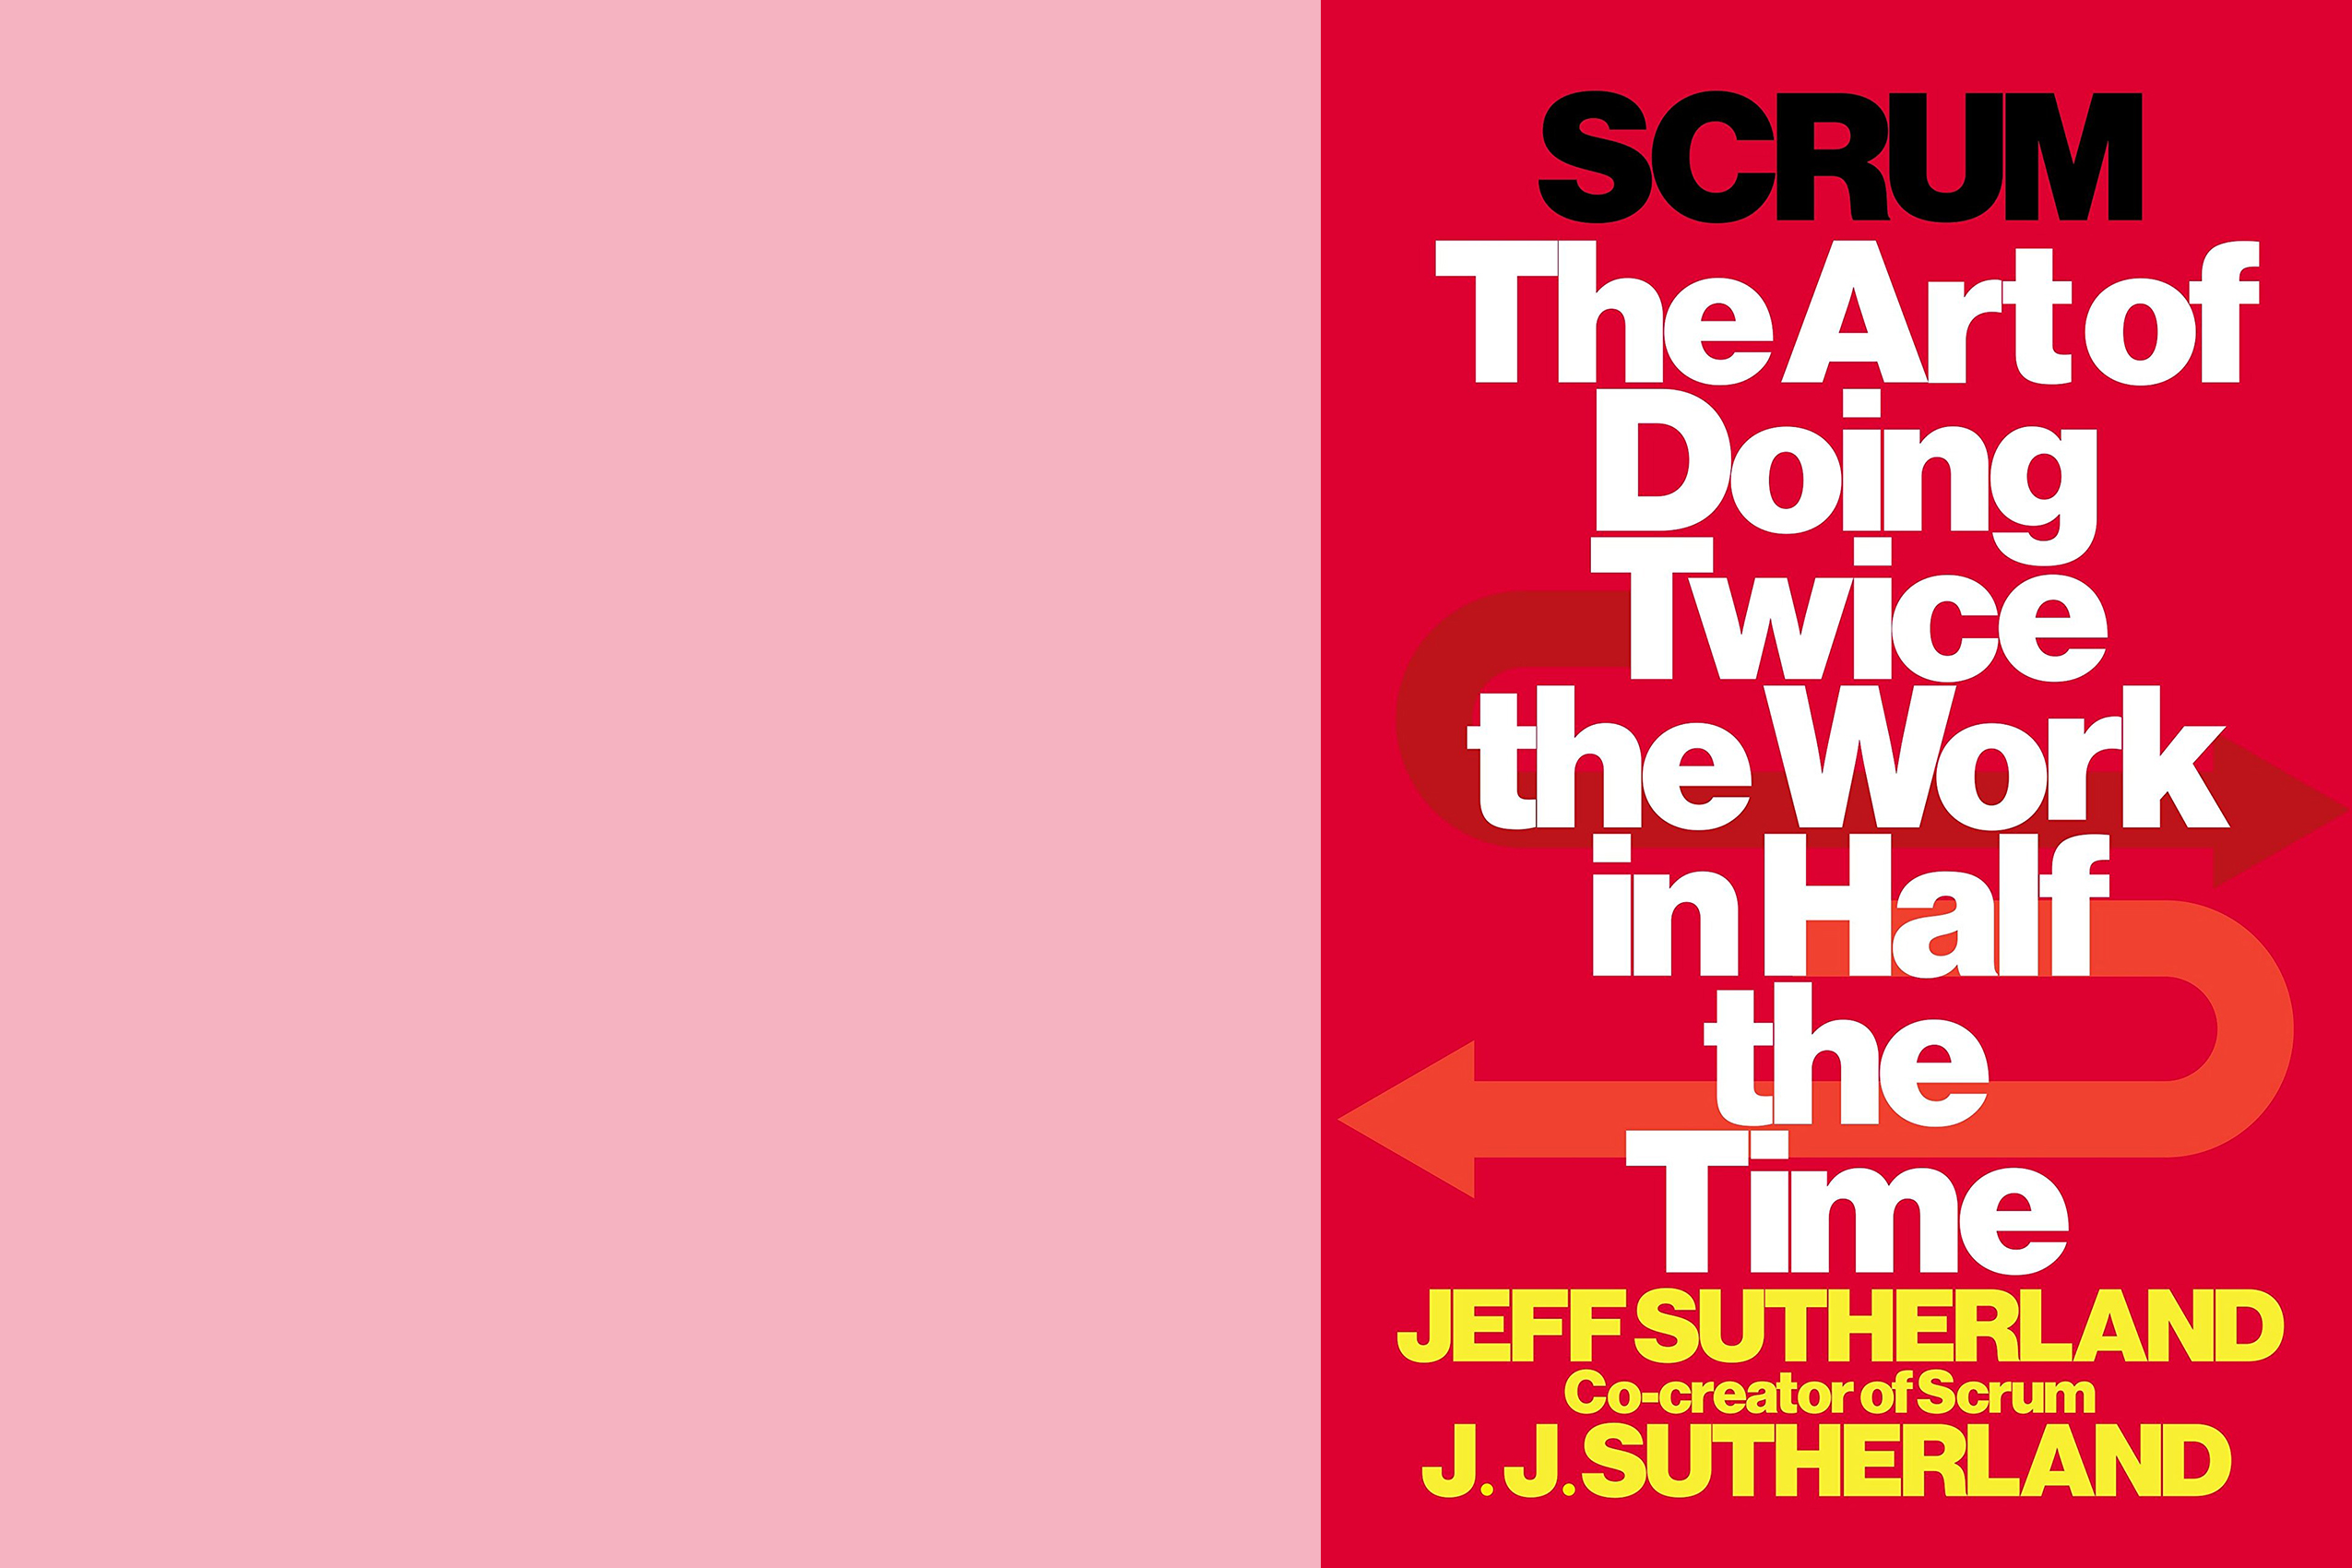 Scrum; Jeff Sutherland; Business; Book